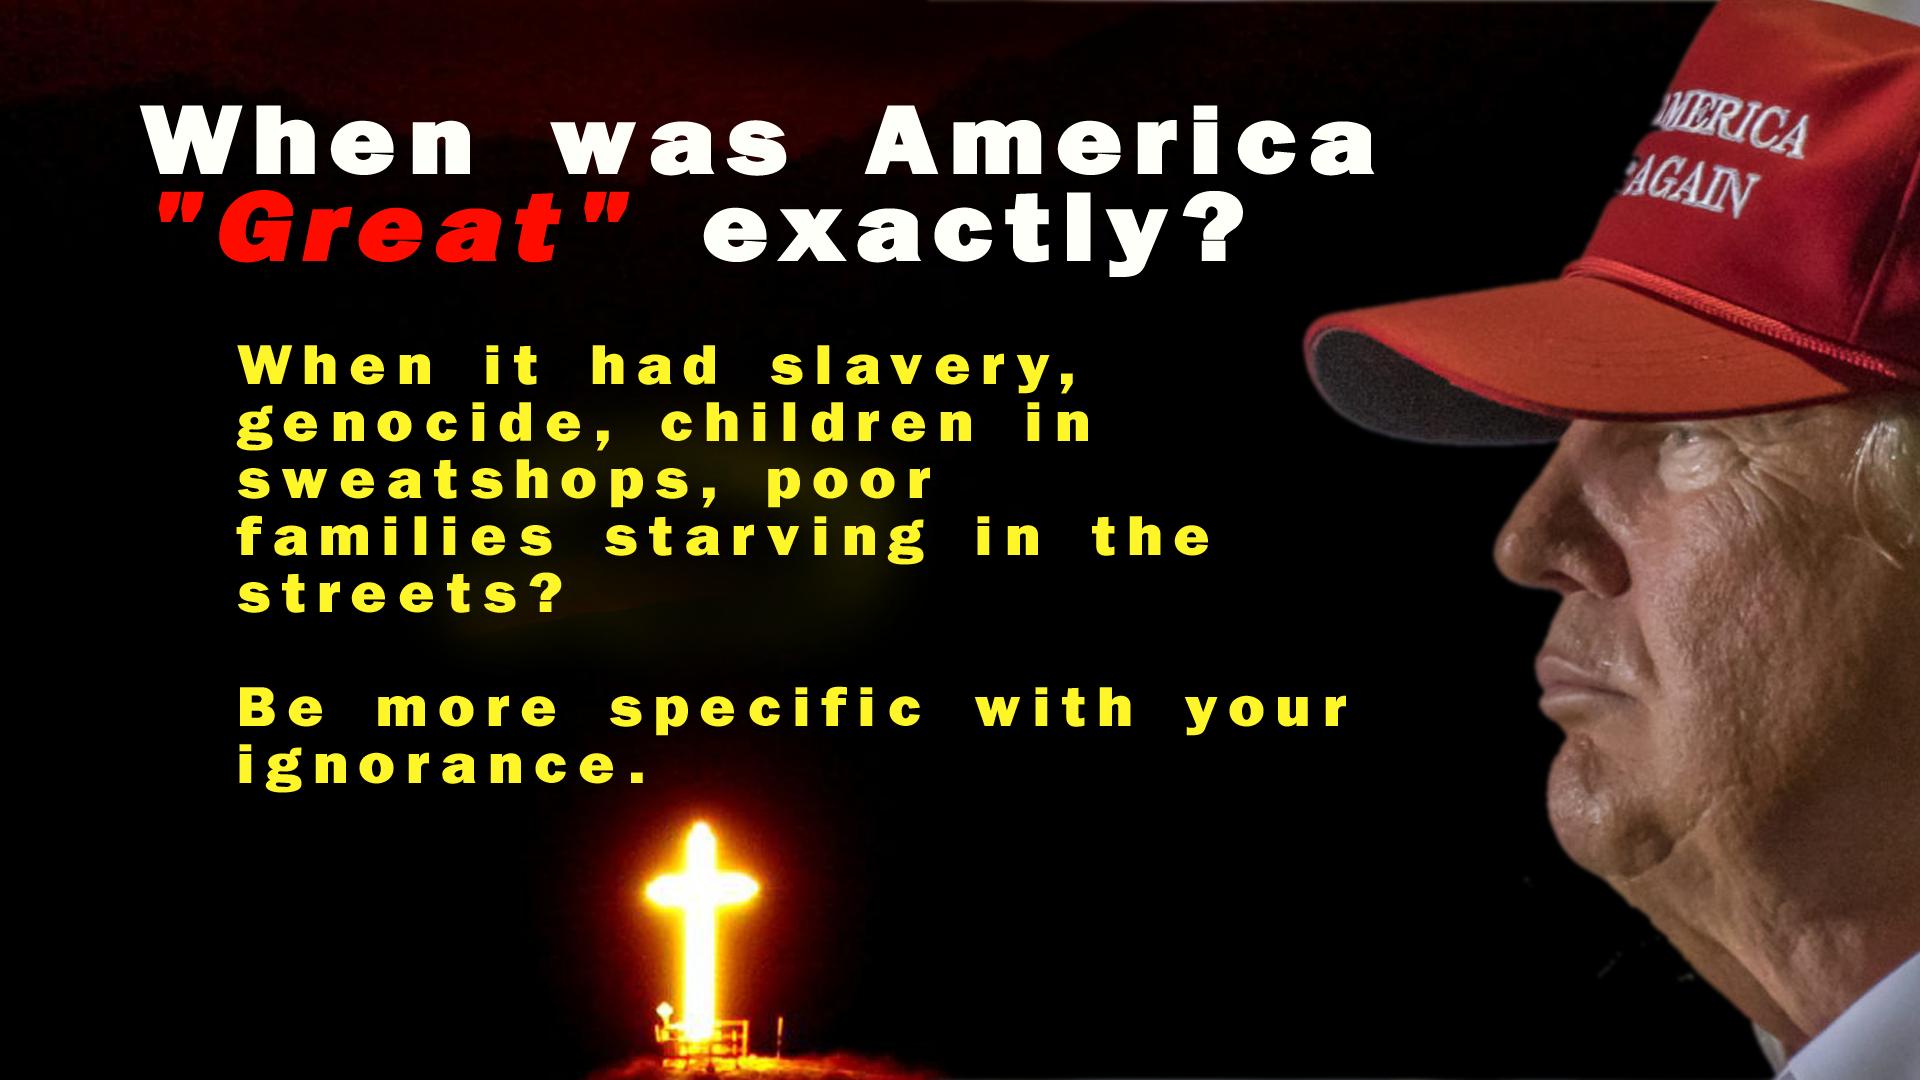 america-the-great-maga copy